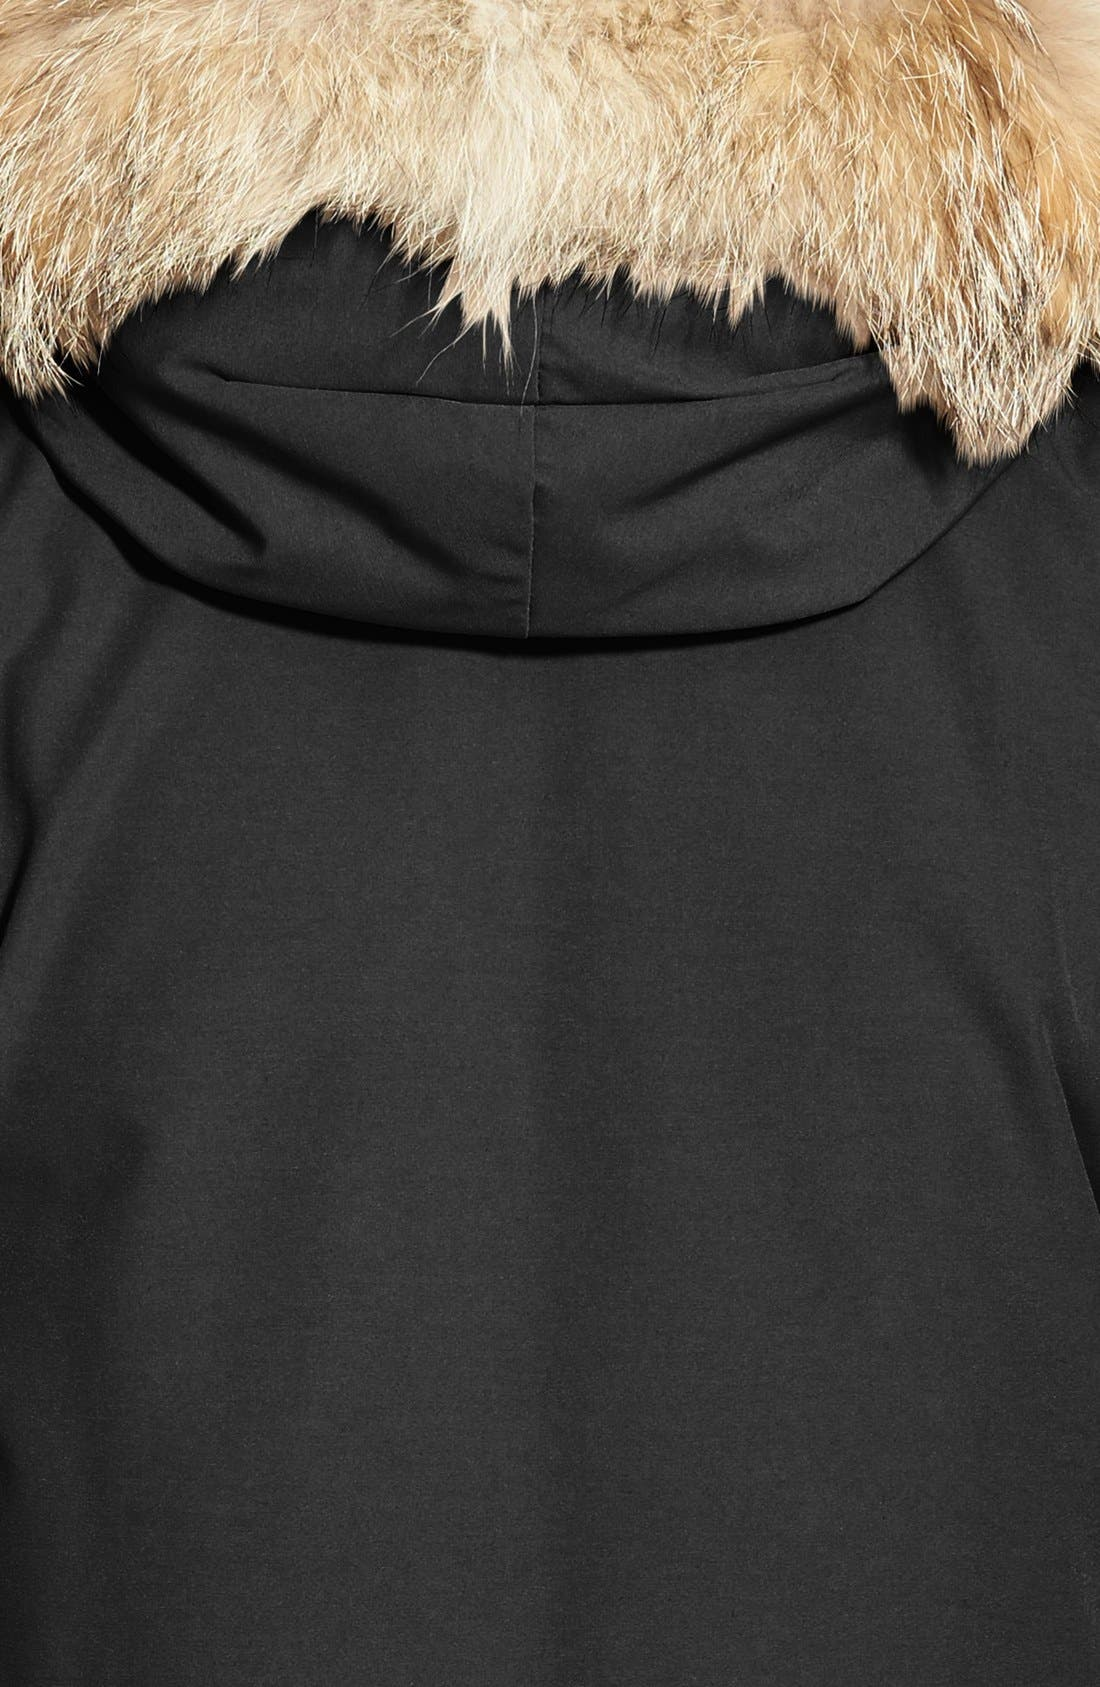 Citadel Slim Fit Parka with Genuine Coyote Fur,                             Alternate thumbnail 3, color,                             BLACK